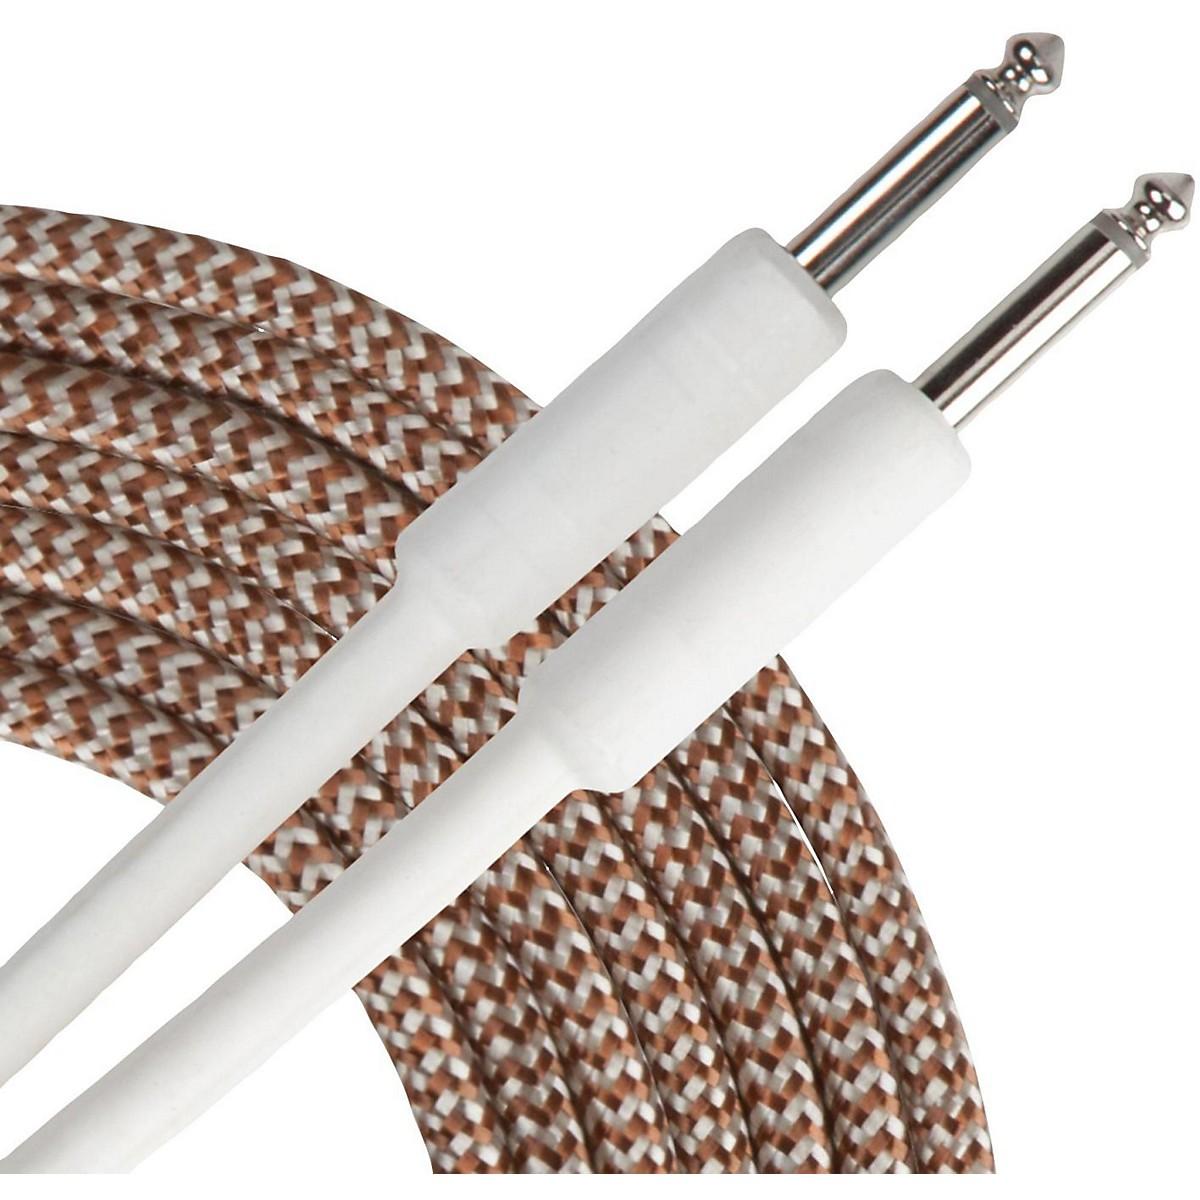 Livewire Advantage Tweed Instrument Cable